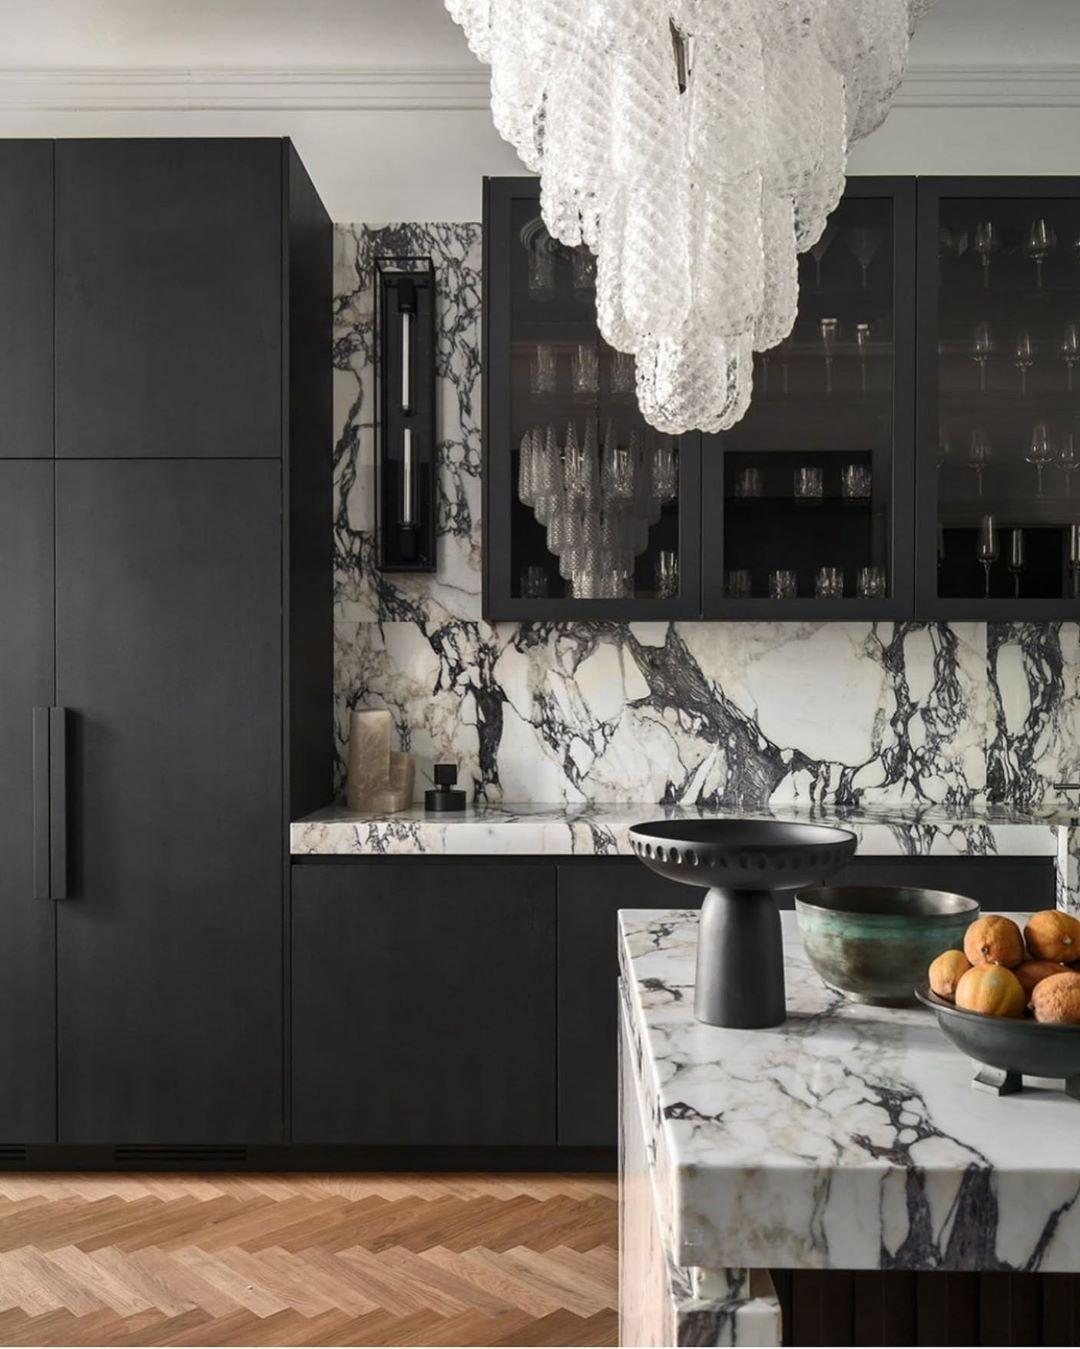 2 778 Likes 37 Comments Kitchens Of Instagram Kitchens Of Insta On Instagram Yup By Kitchensbypaul Ph In 2020 Interior Kitchen Cabinet Design Grand Kitchen